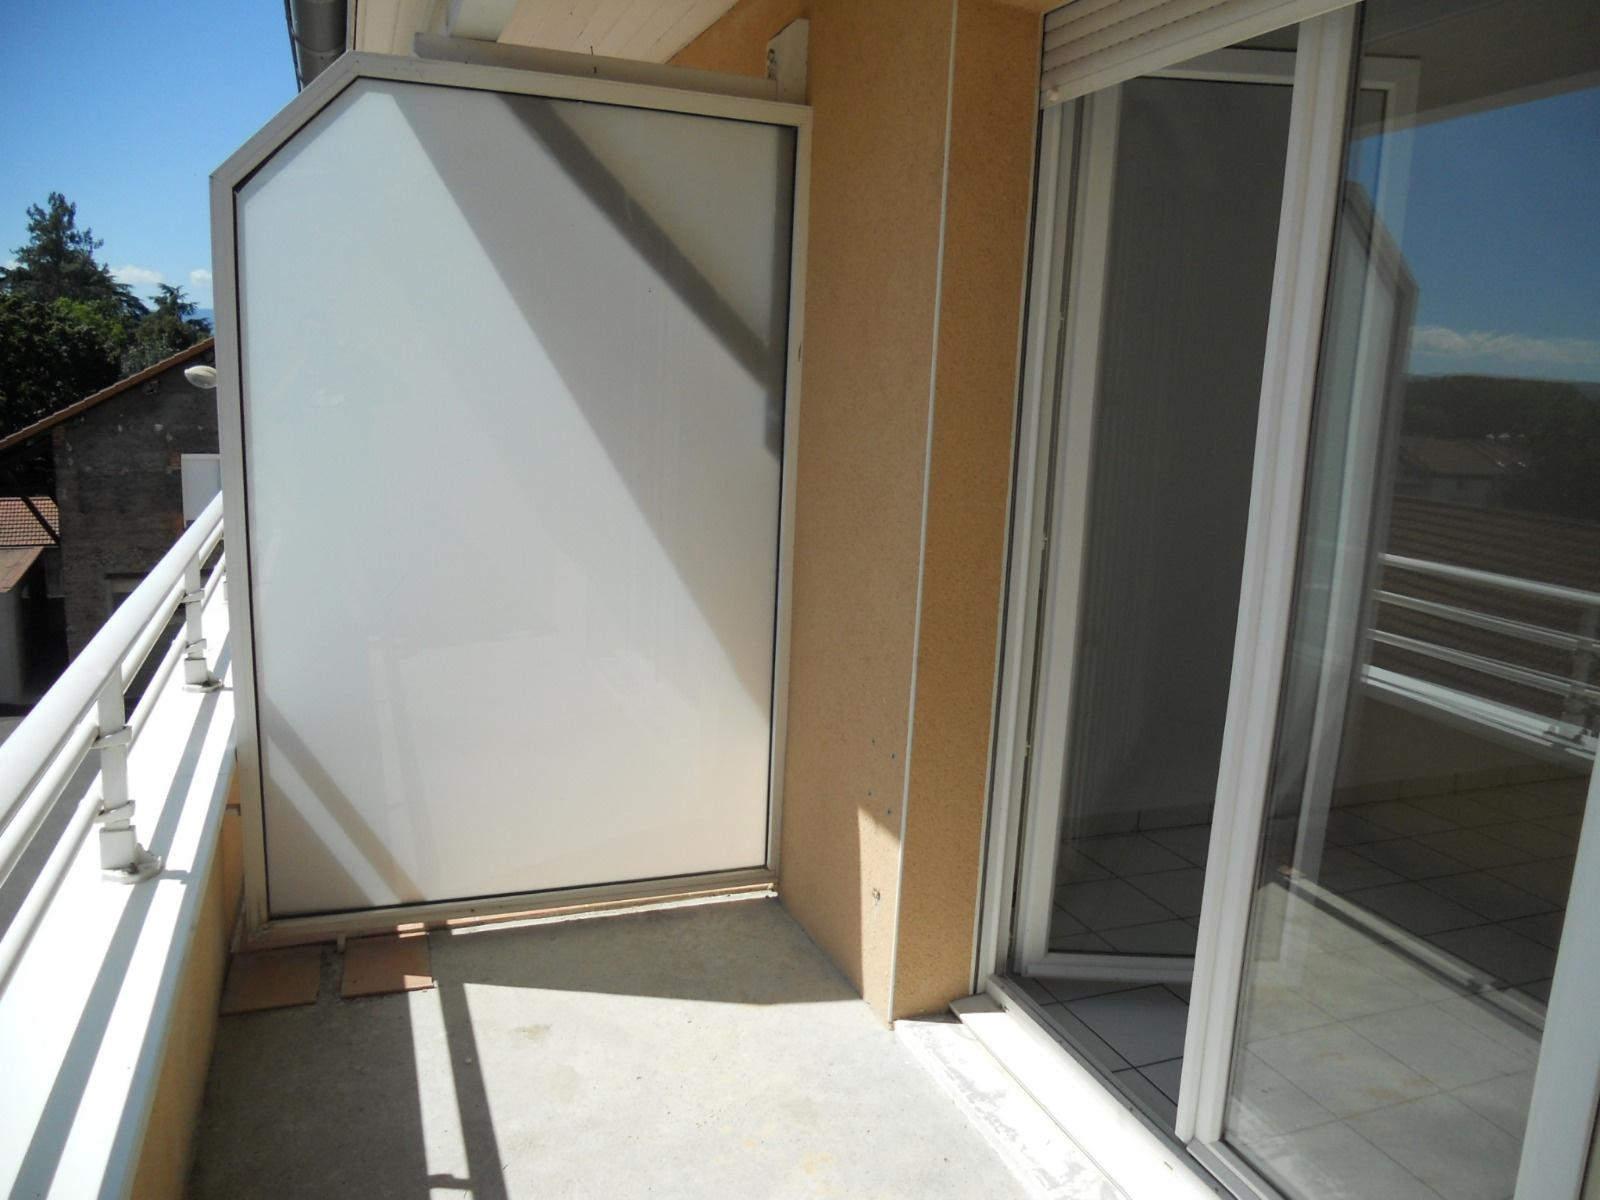 Acheter appartements saint tienne cabinet tardy immobilier for Garage tardy saint etienne